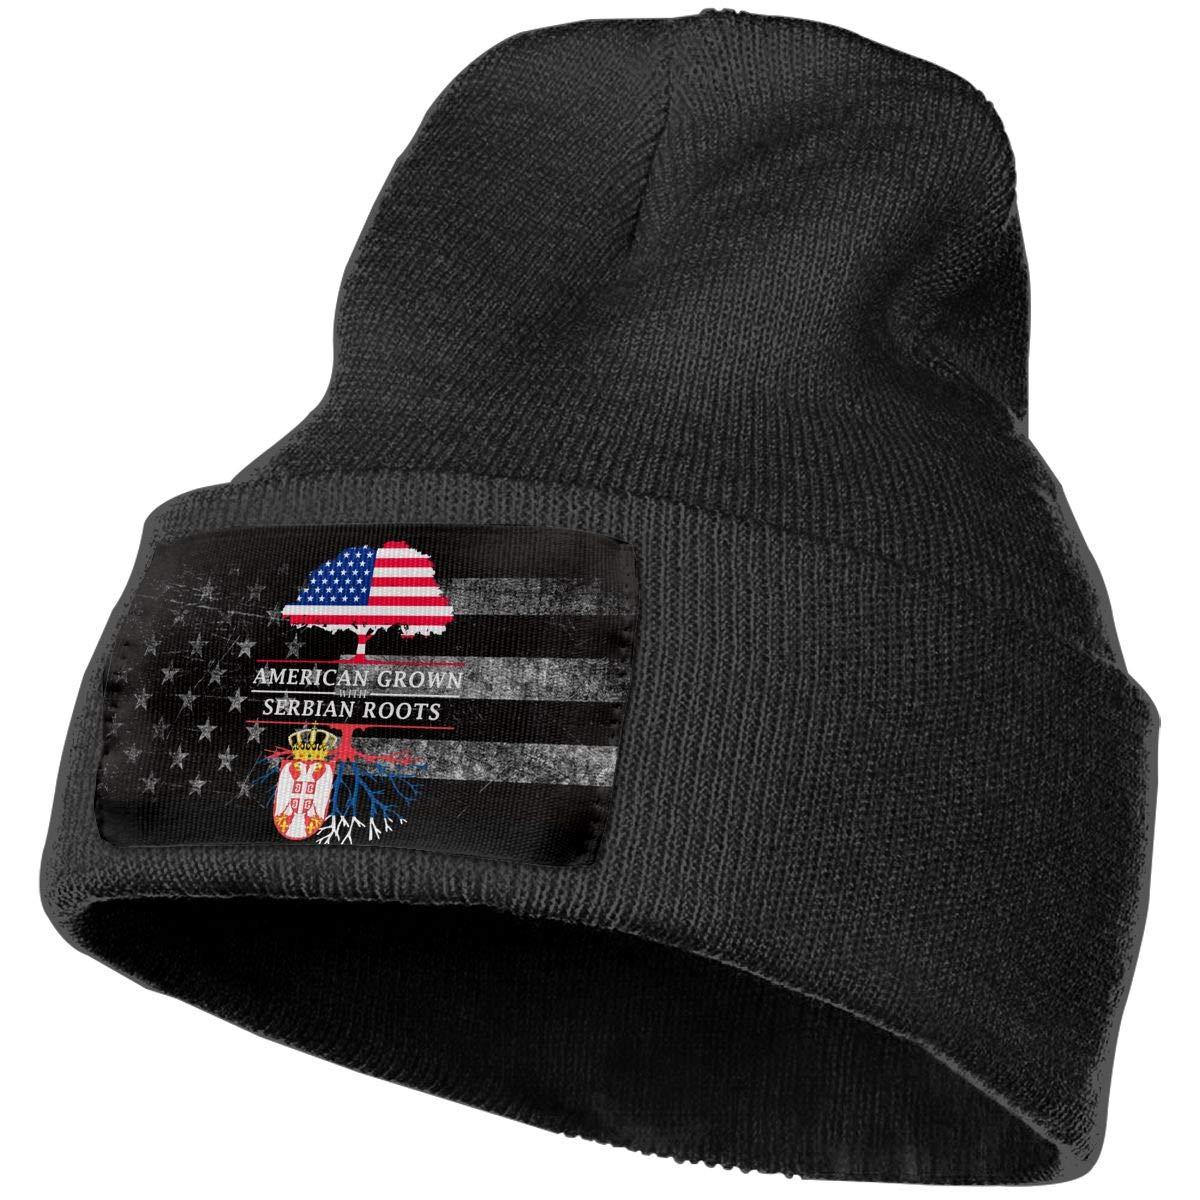 FORDSAN CP American Grown with Serbian Roots Mens Beanie Cap Skull Cap Winter Warm Knitting Hats.